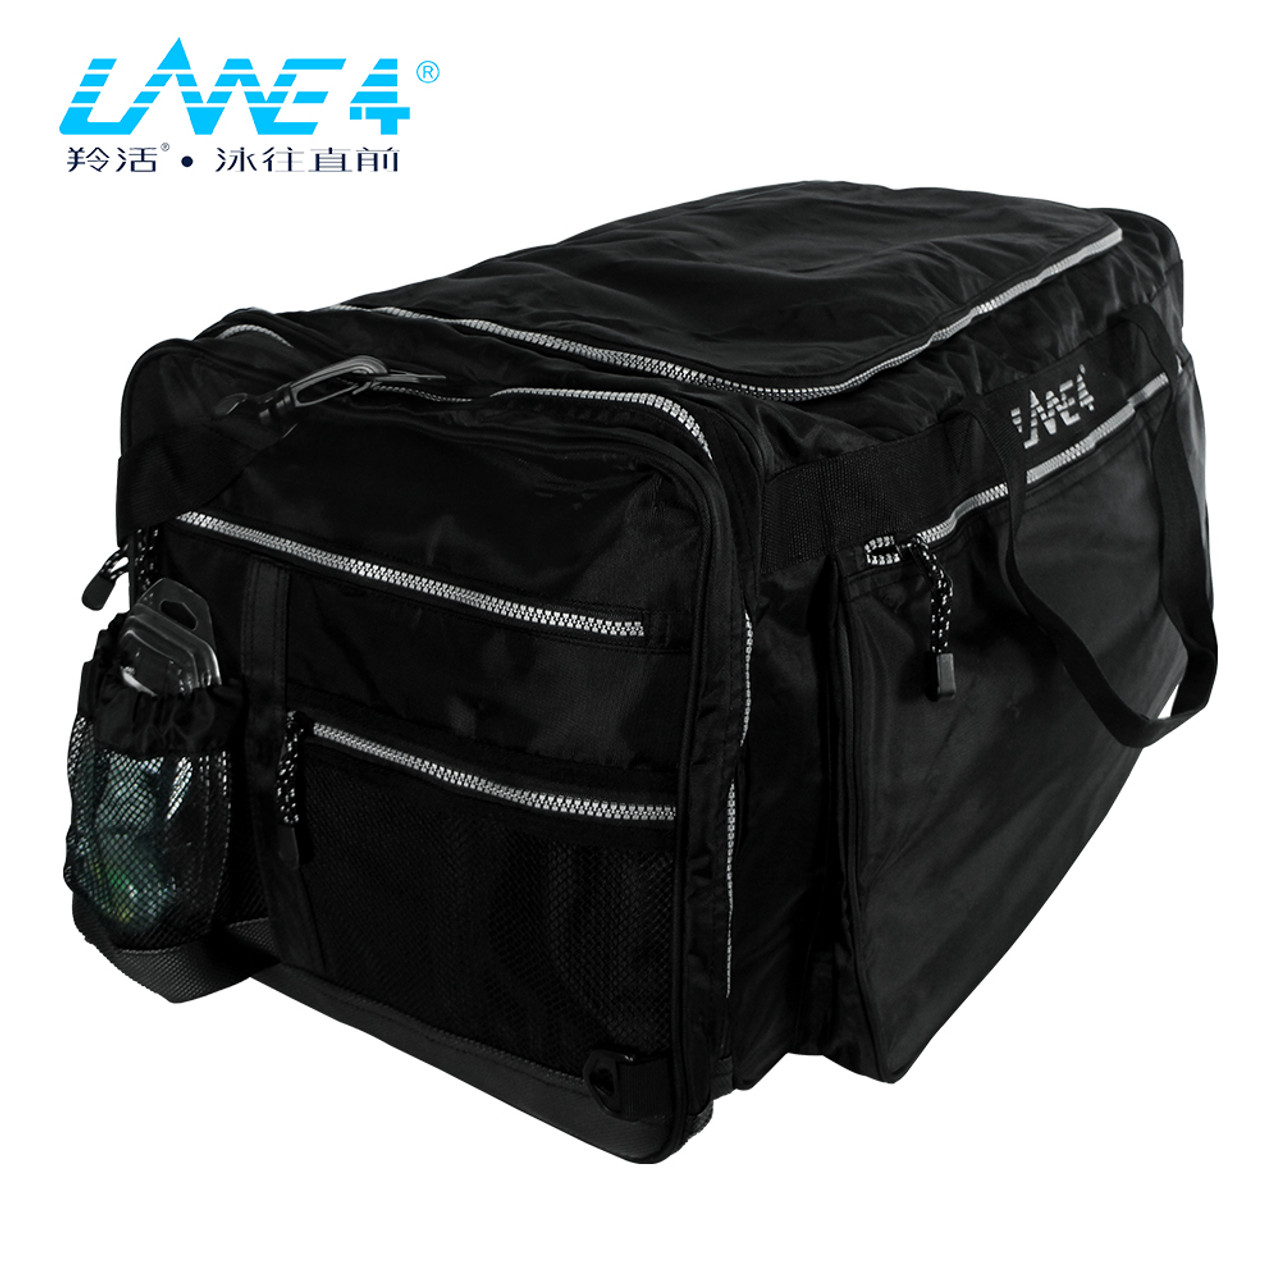 Best Waterproof Rolling Duffel Bag   ReGreen Springfield 49bbdb1162